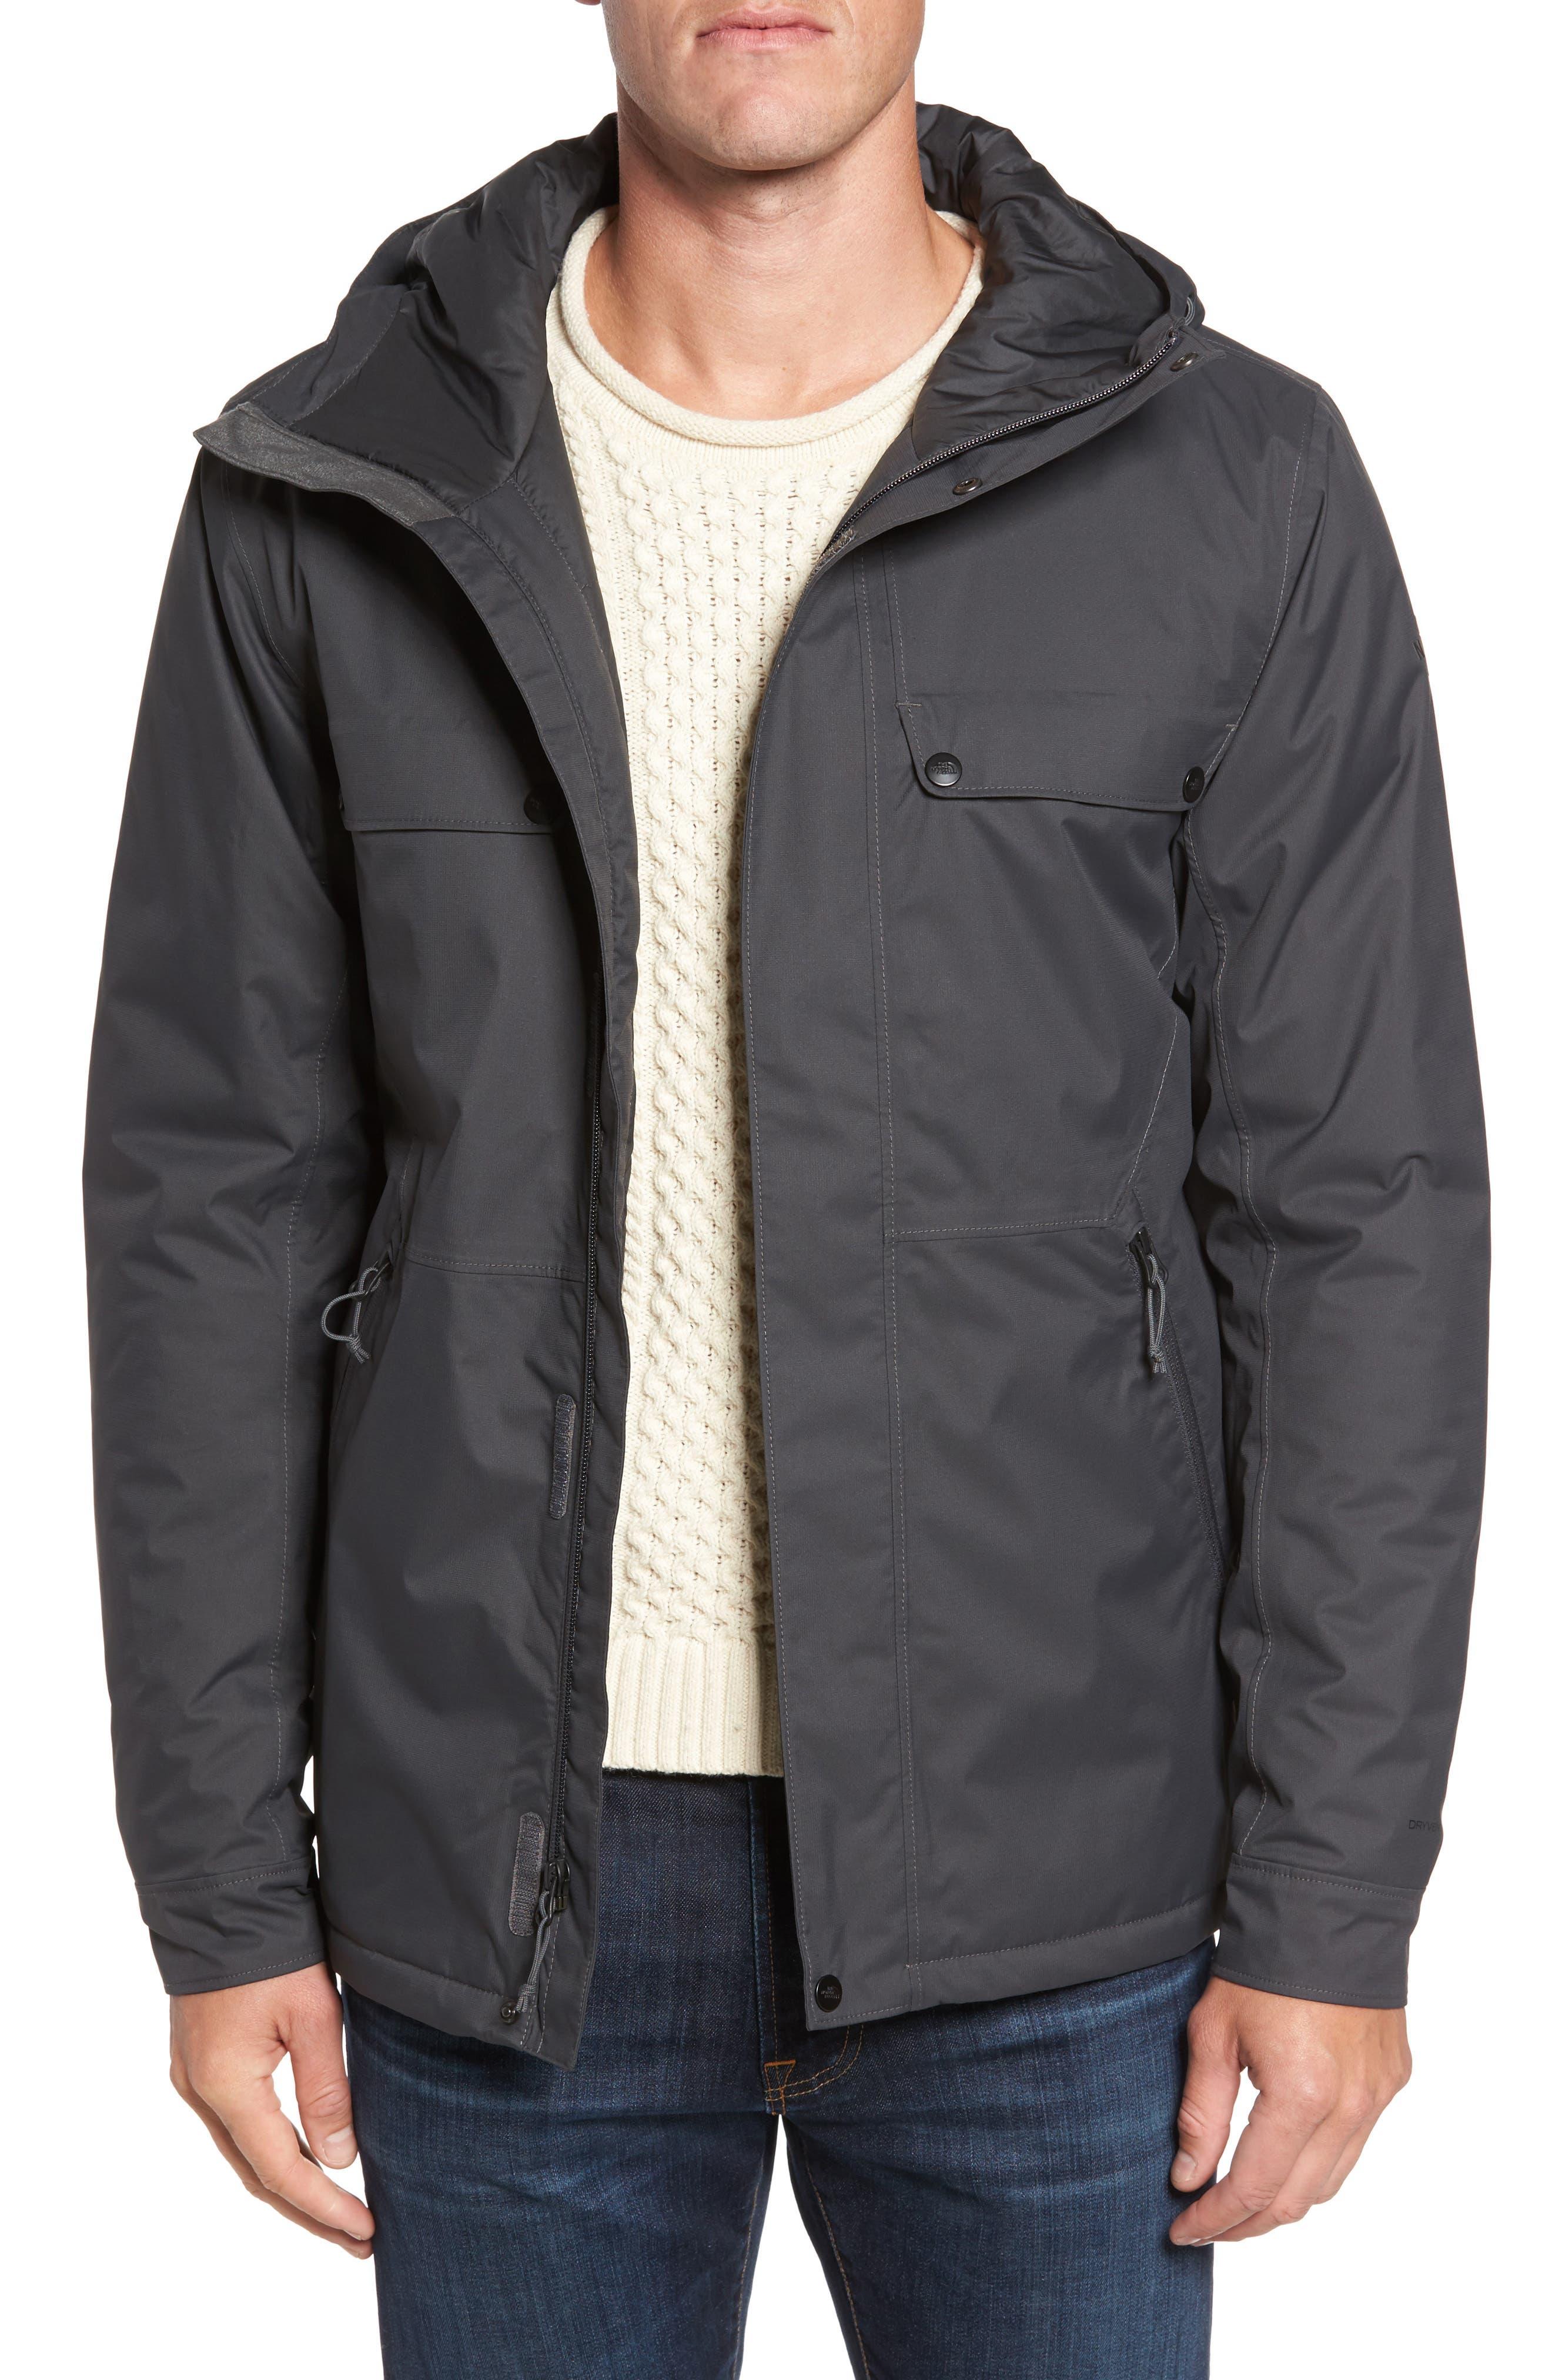 Jenison Insulated Waterproof Jacket,                         Main,                         color, Grey